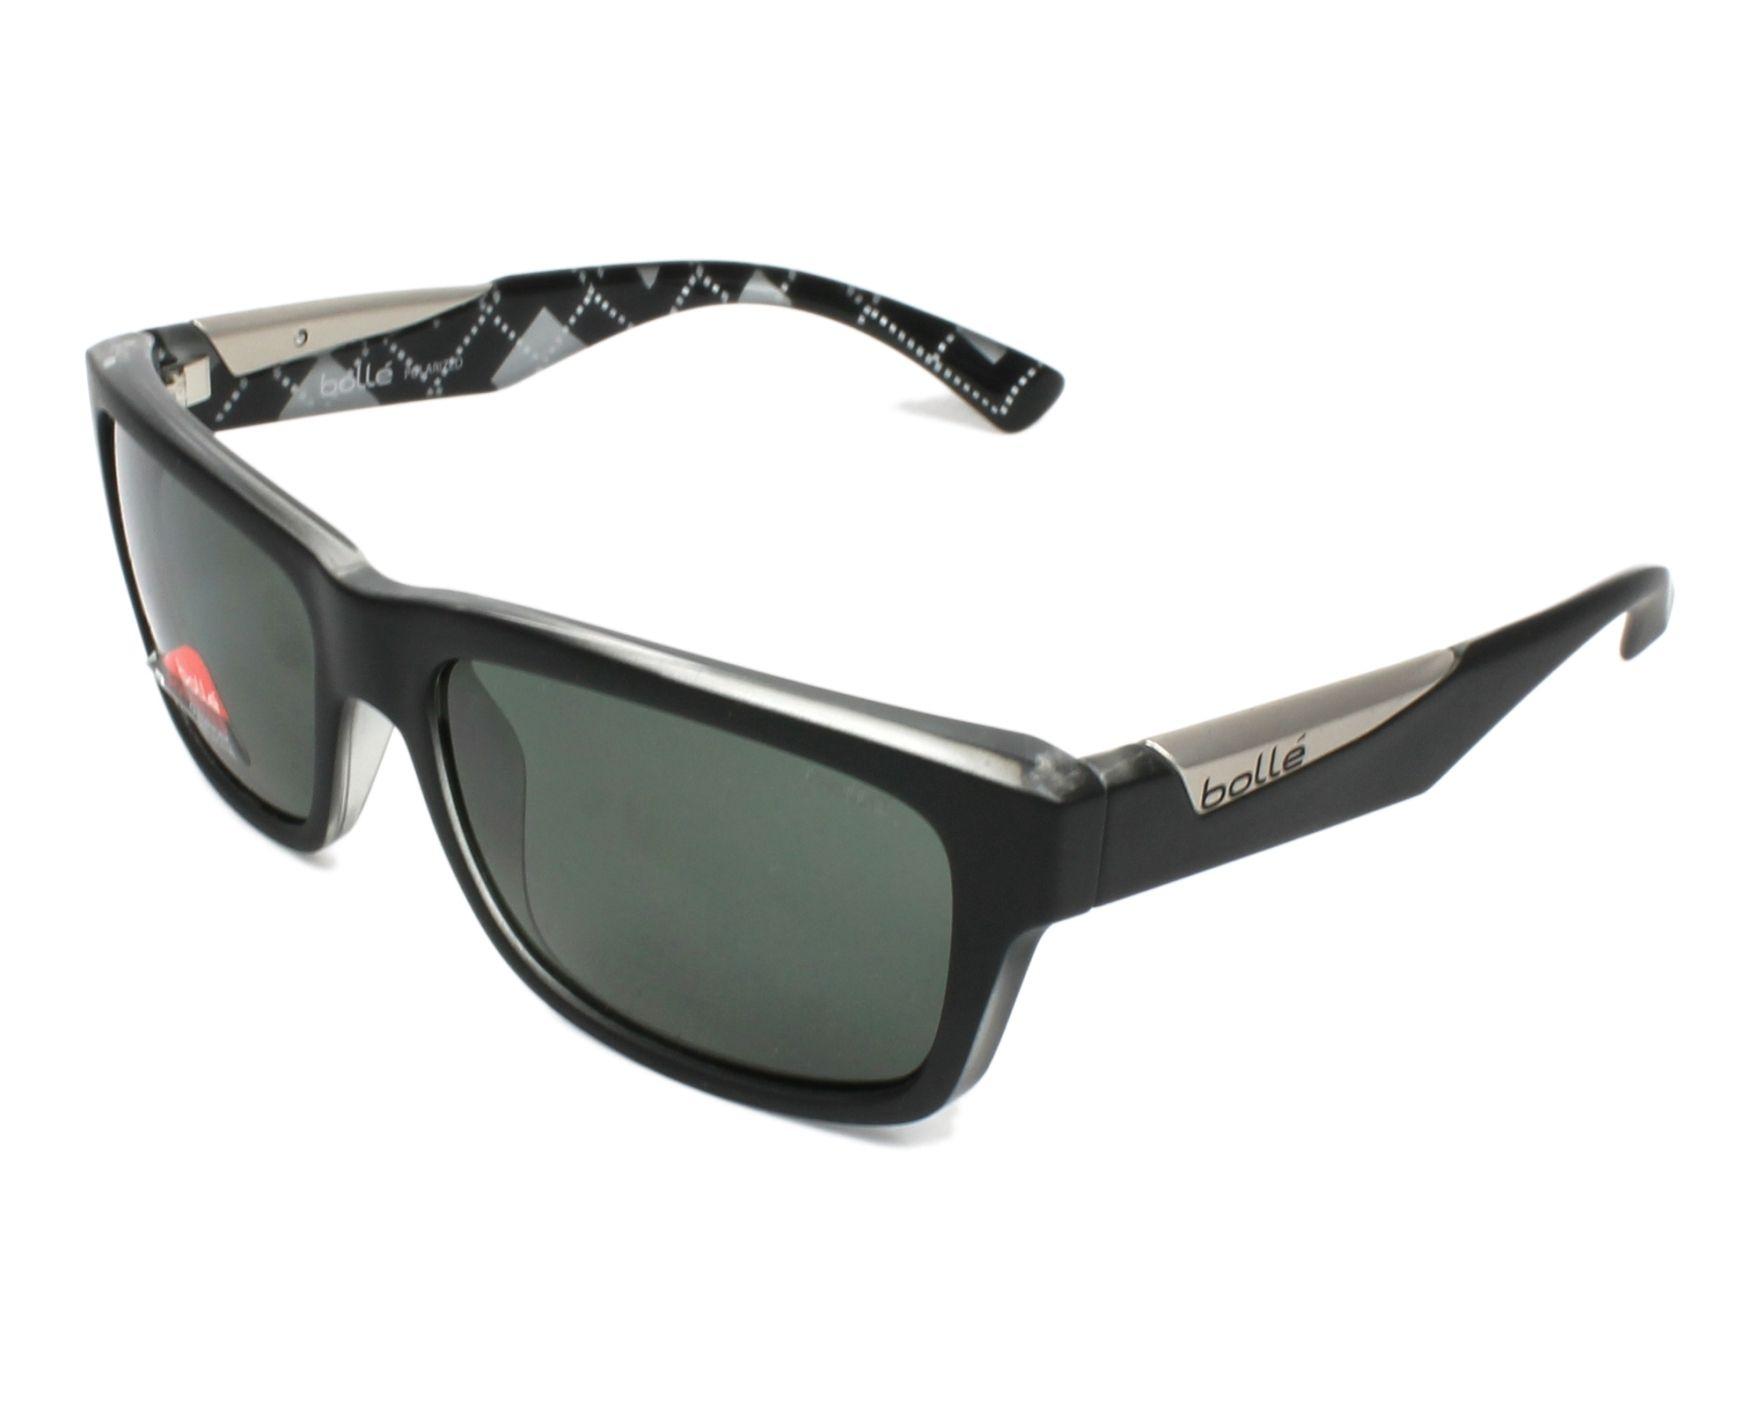 efc235888e Gafas de sol Bollé JUDE 11833 - Negra Cristal vista de perfil